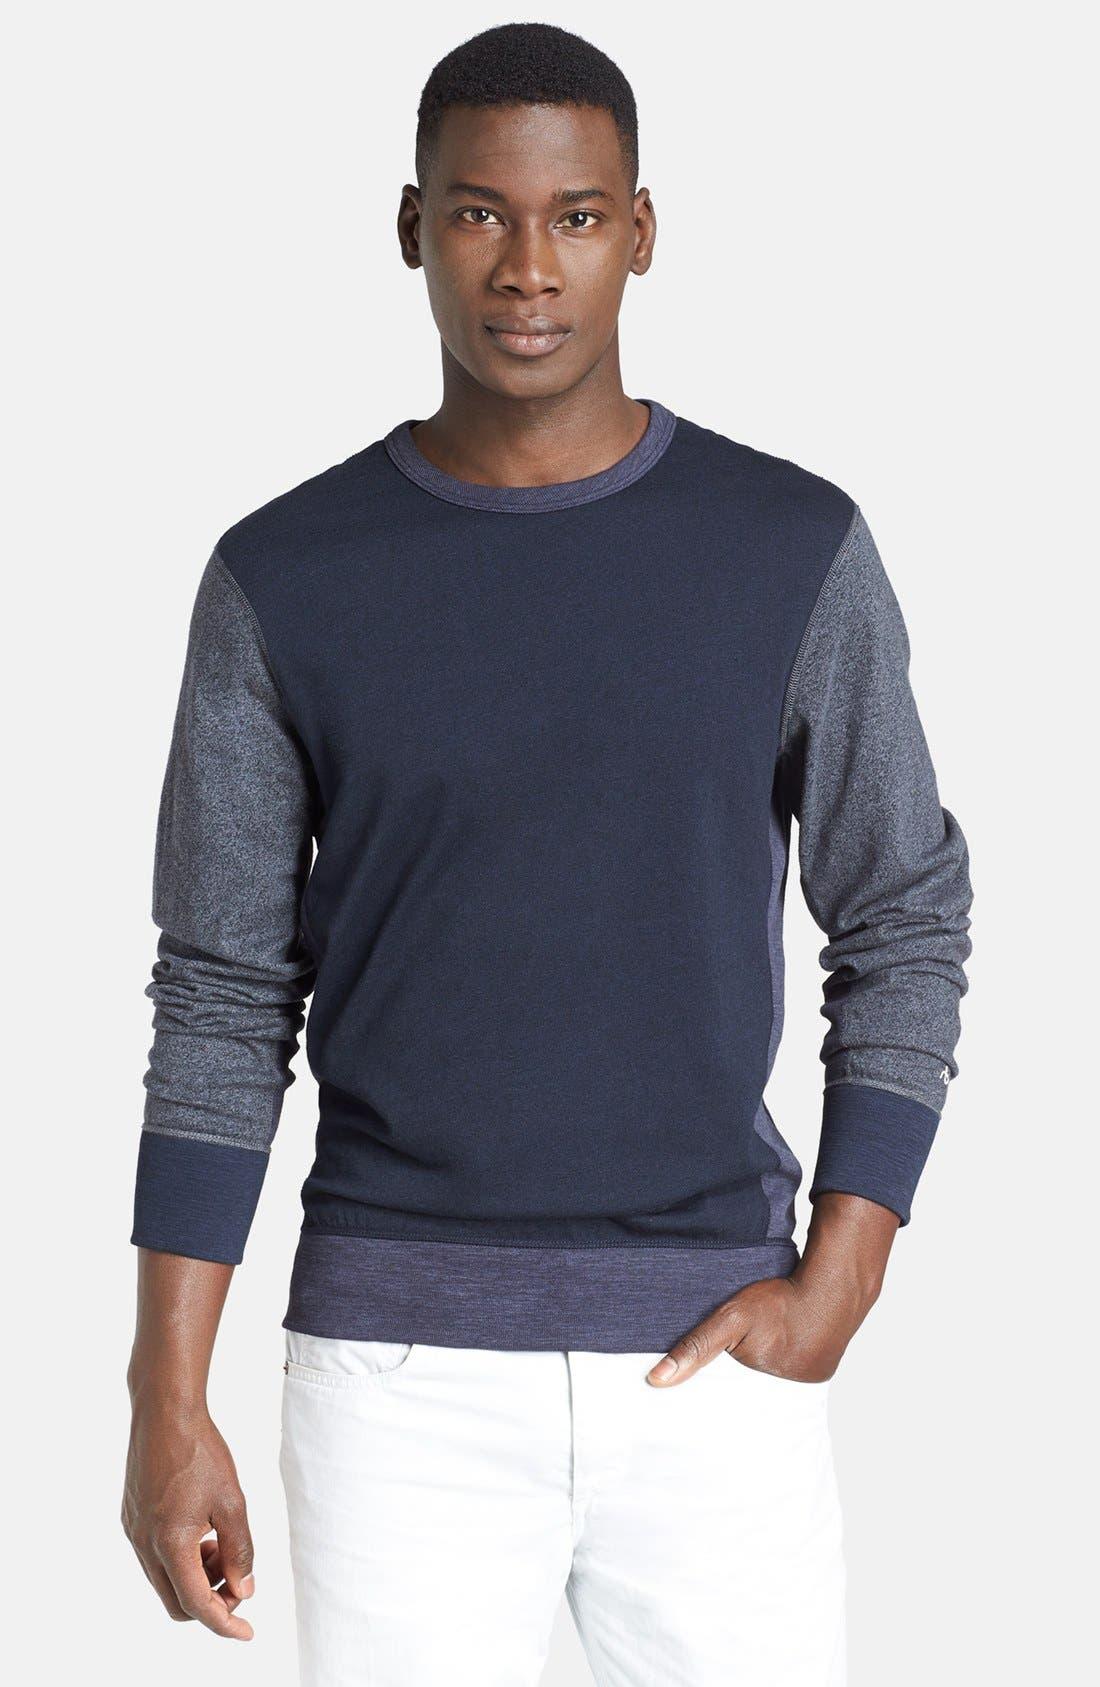 Alternate Image 1 Selected - rag & bone Colorblock Flame Jersey Crewneck Sweatshirt